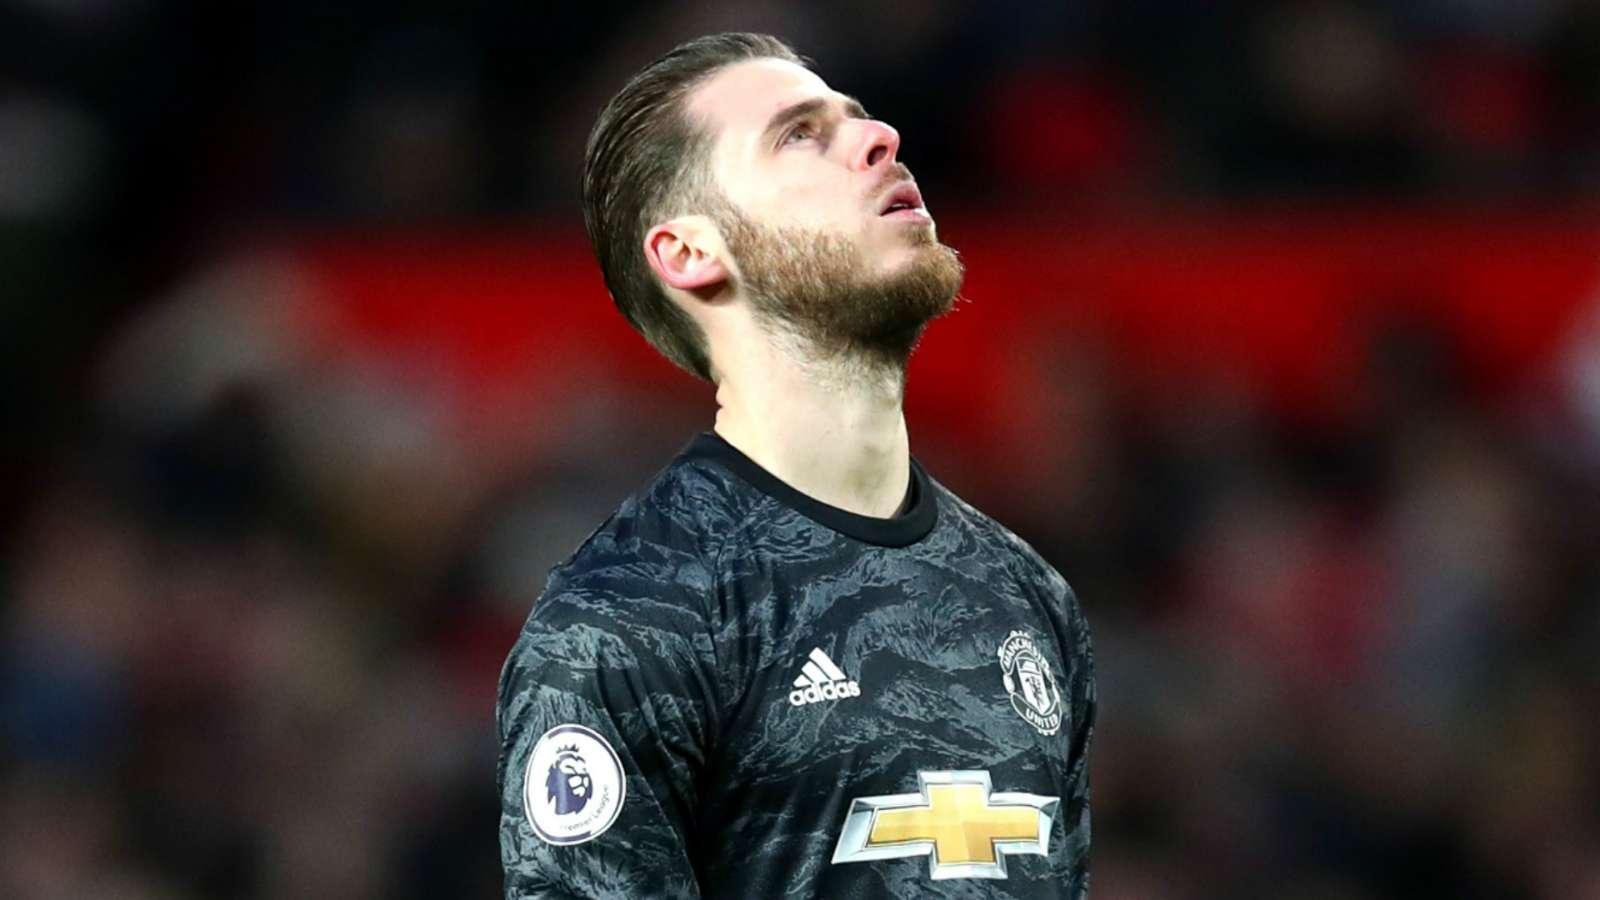 Jelang Musim Panas, Masa Depan David De Gea Di Manchester United Masih Buram